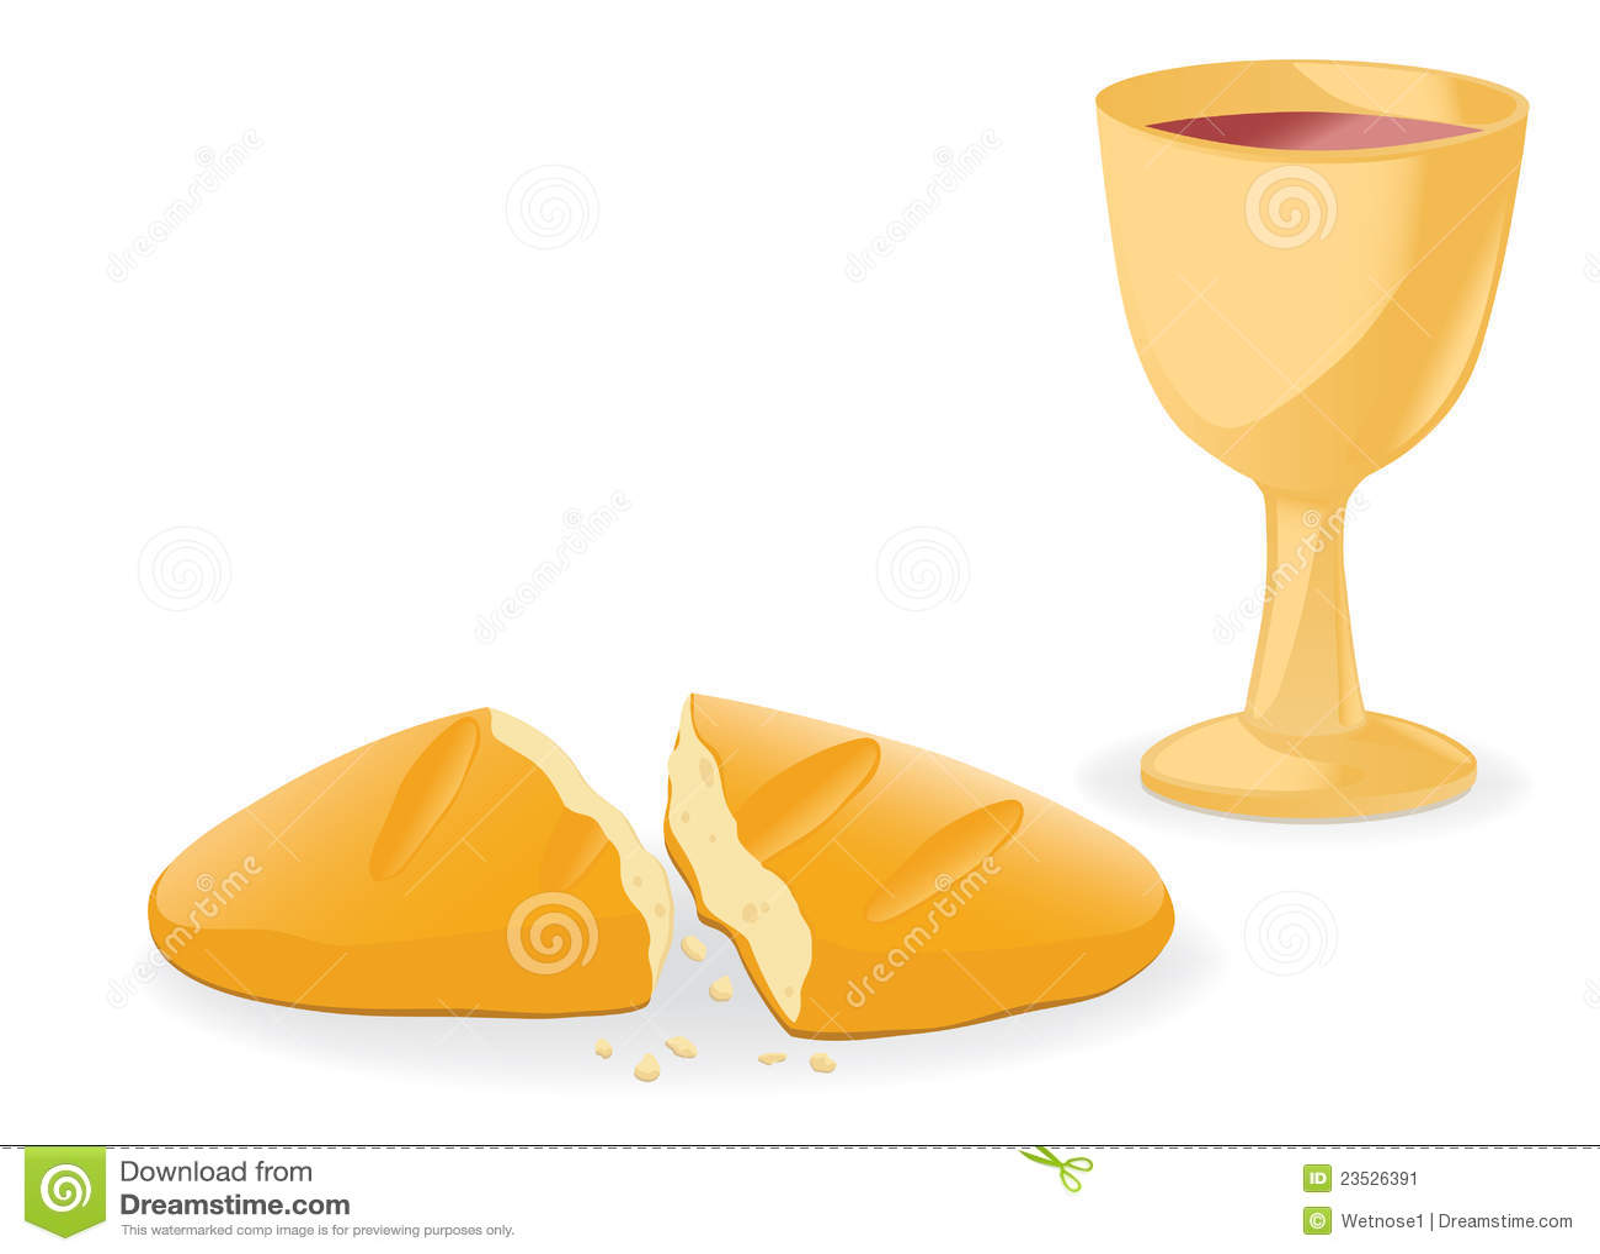 Illustration of... Clipart Communion Bread And Wine